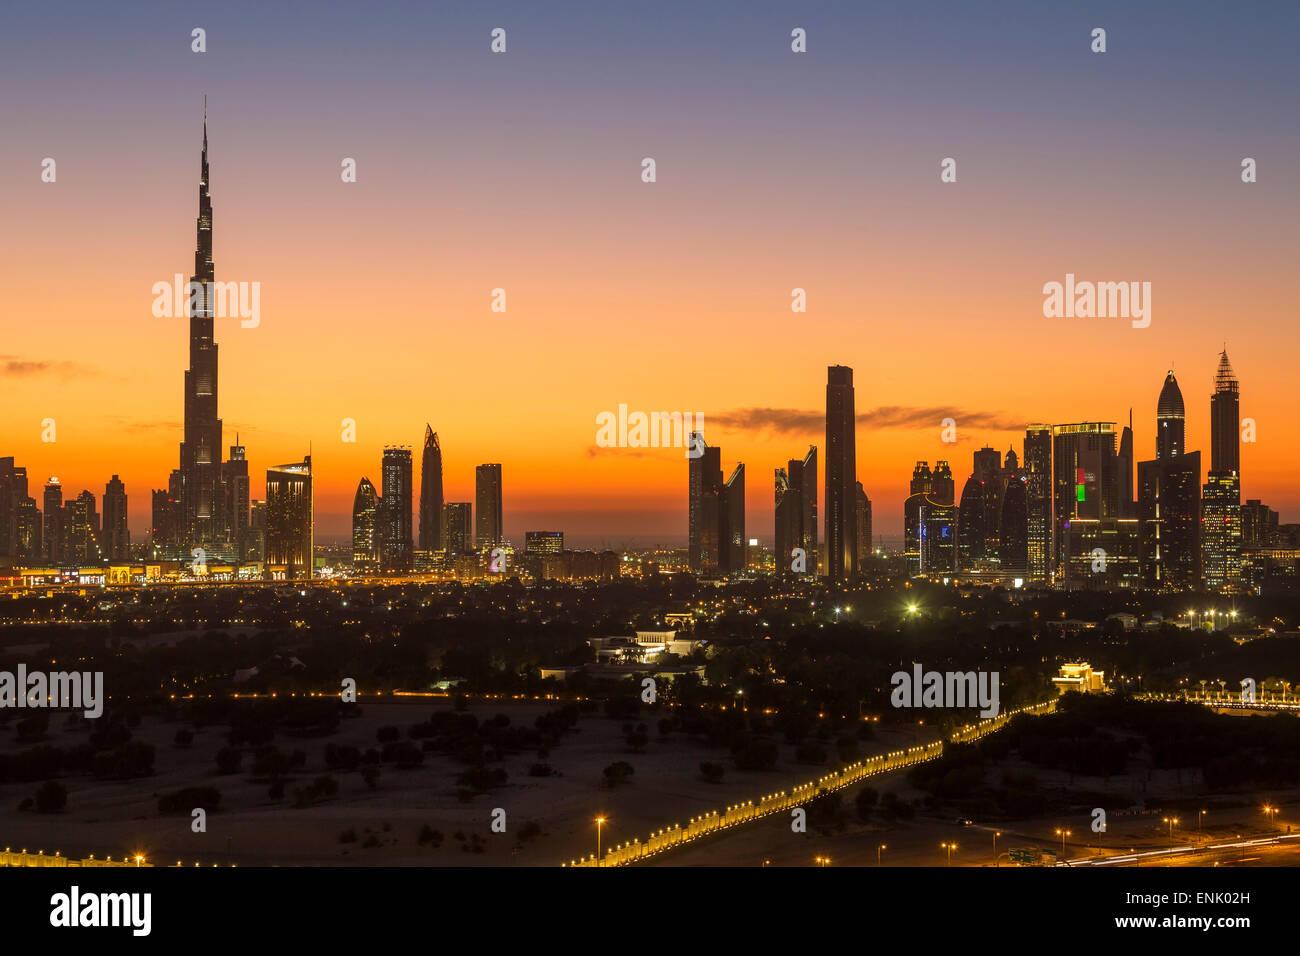 Dubai skyline, the Burj Khalifa, modern architecture and skyscrapers on Sheikh Zayed Road, Dubai, United Arab Emirates - Stock Image